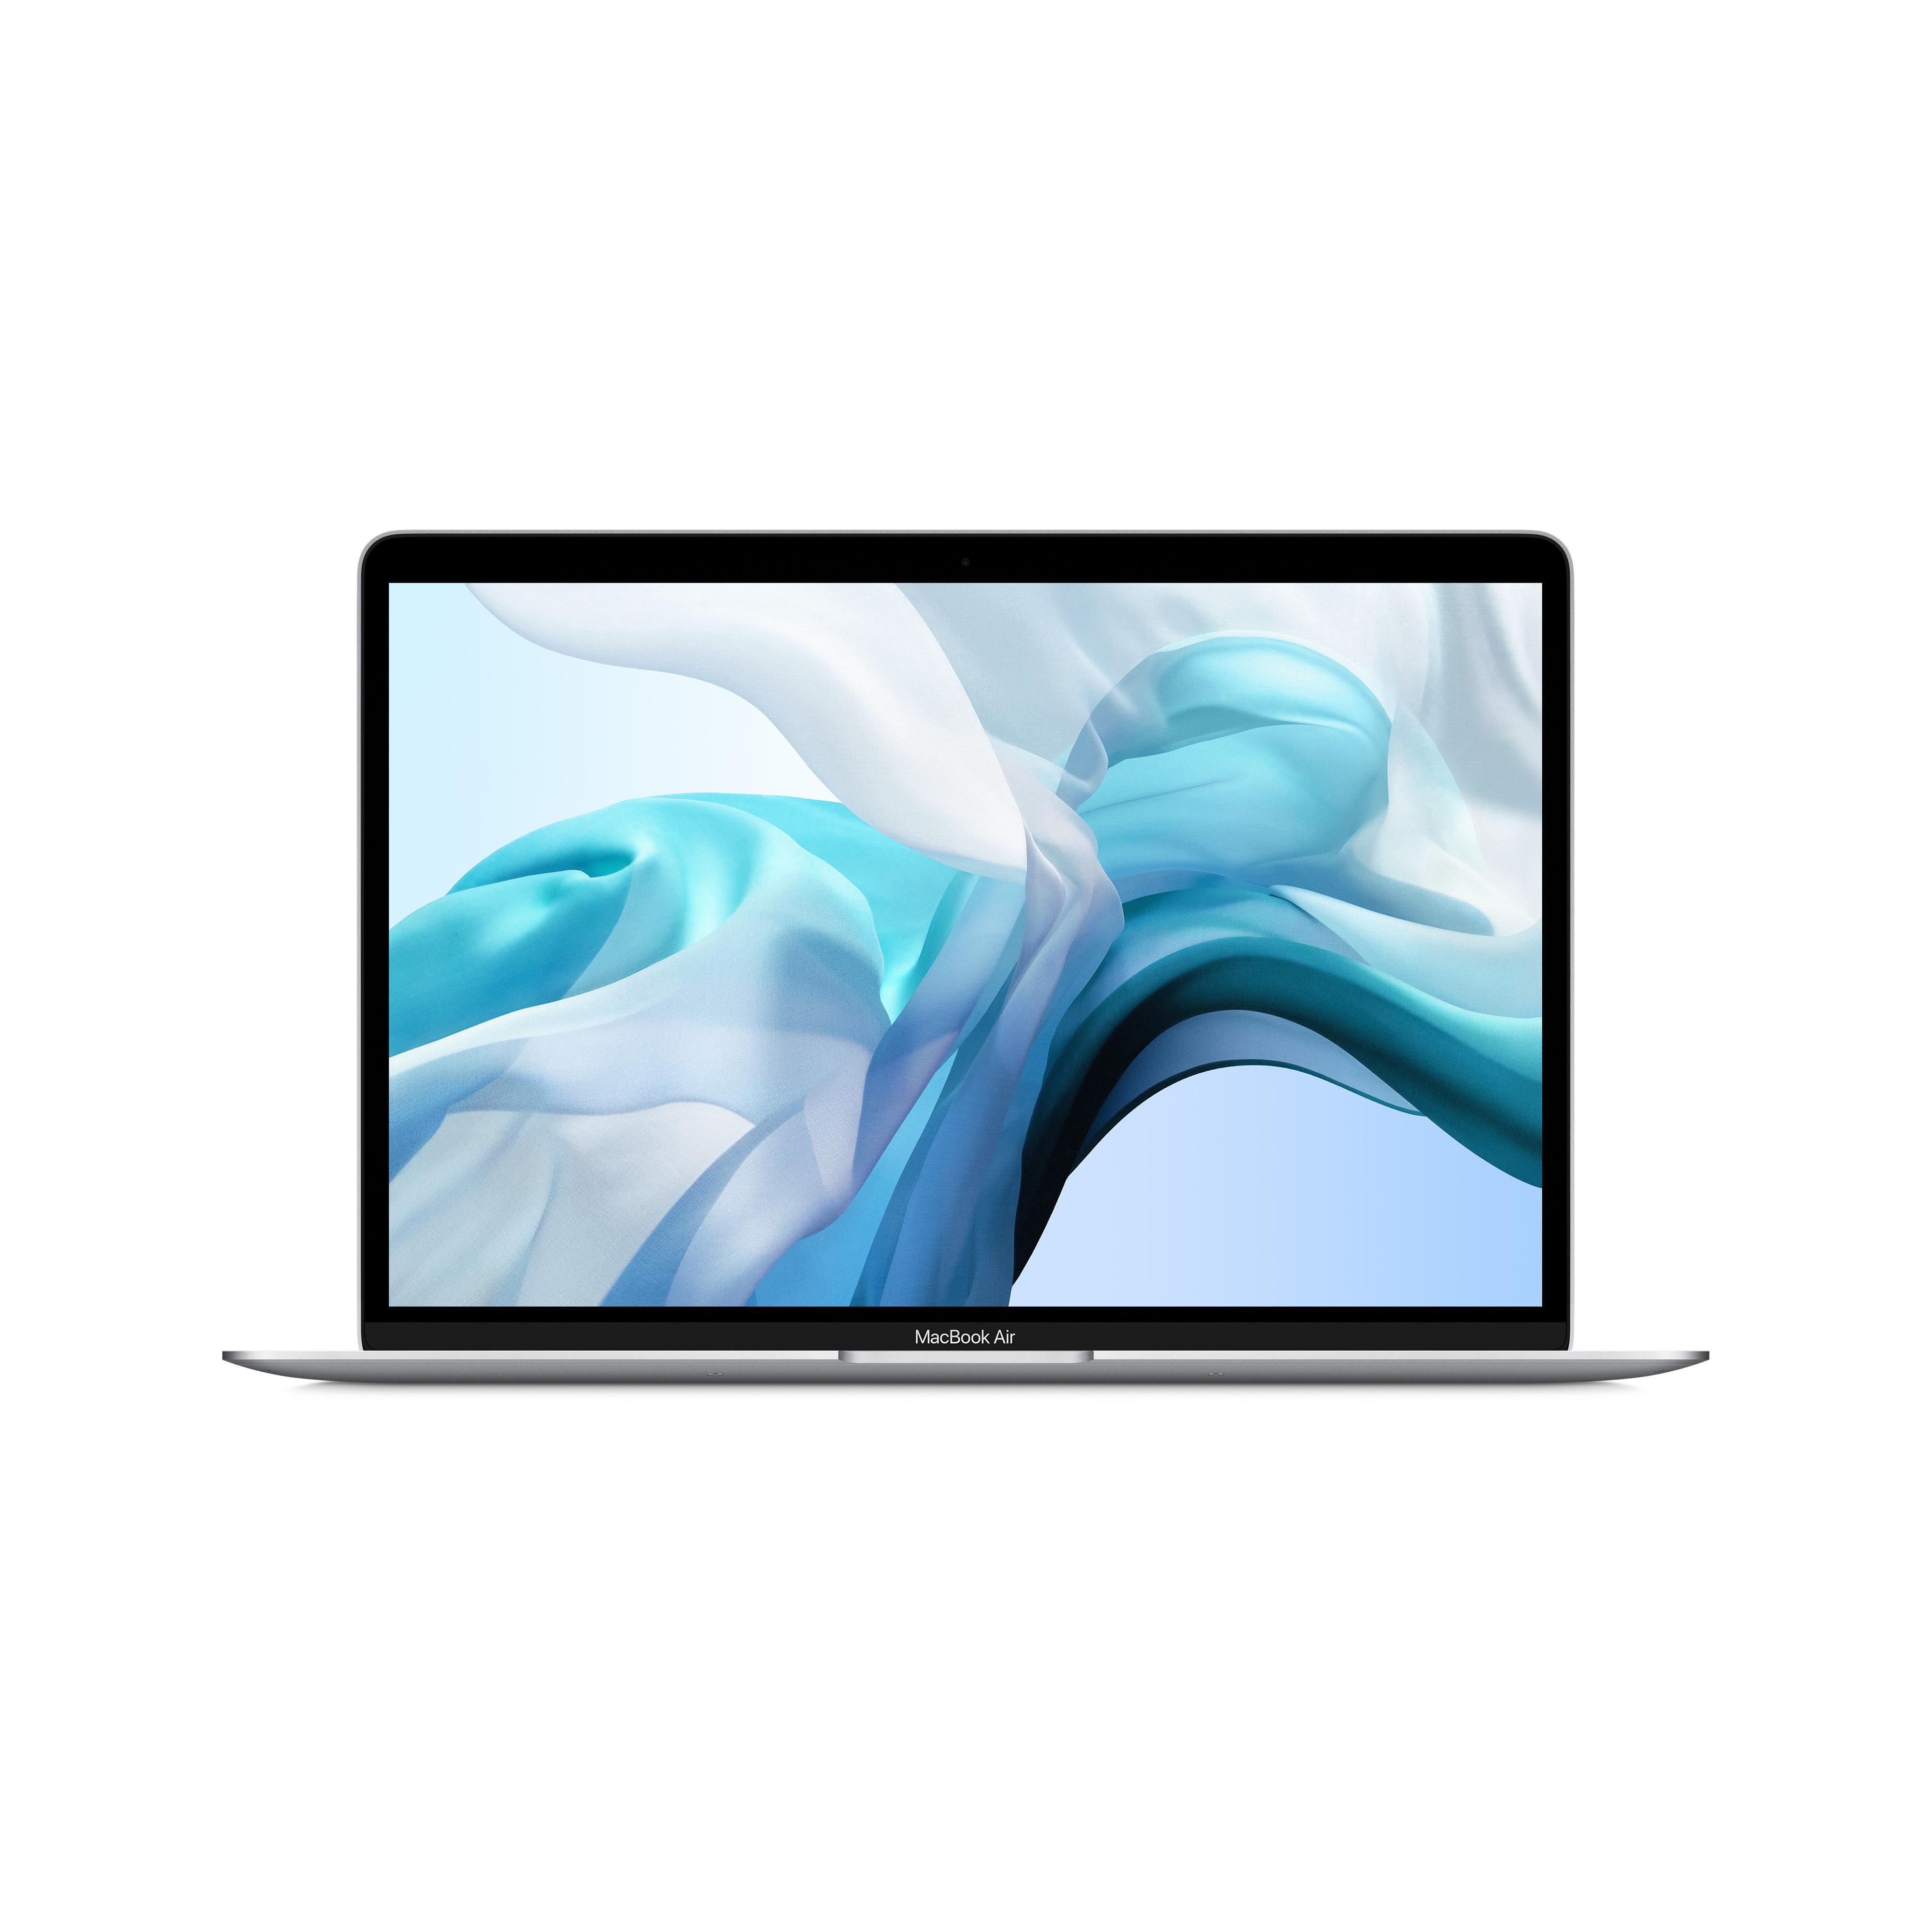 APPLE MacBook Air 13.3 (2020) – Zilver i5 8GB 512 GB